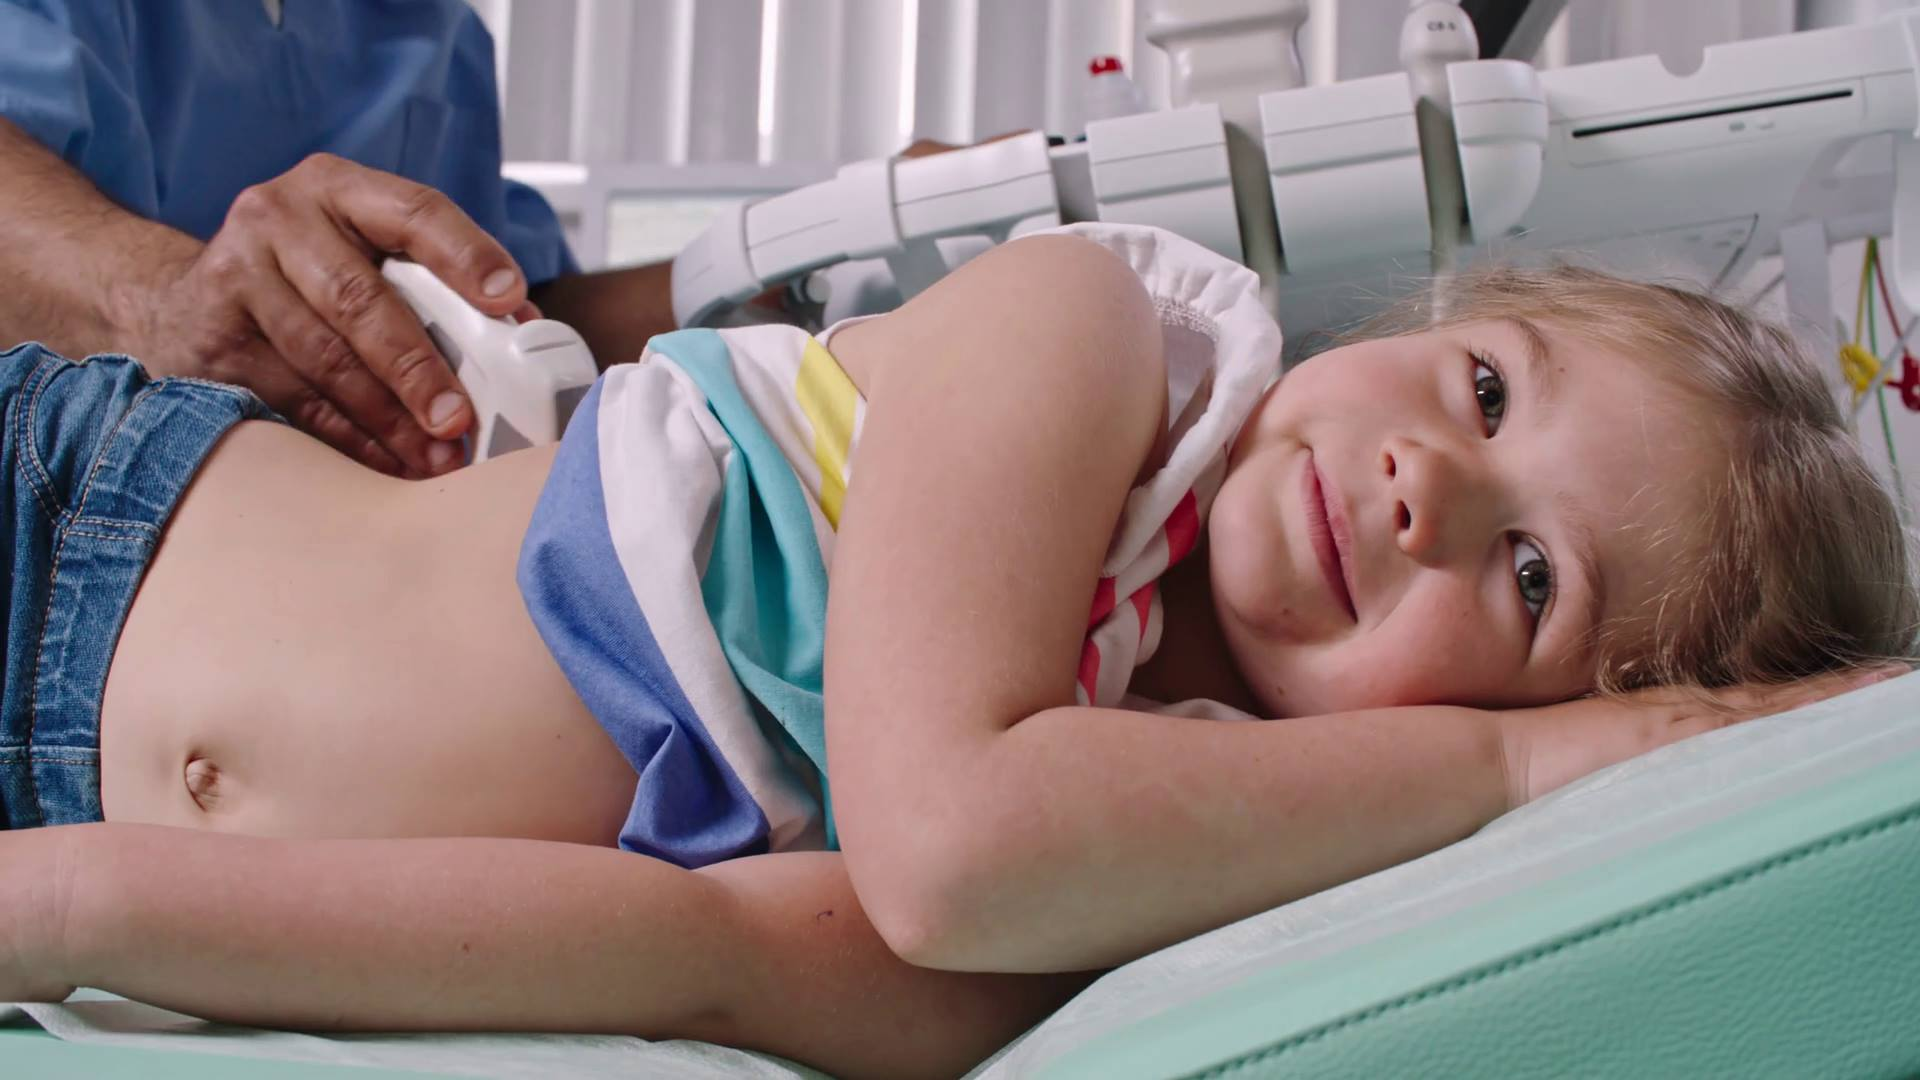 Invotro: УЗИ-диагностика для детей